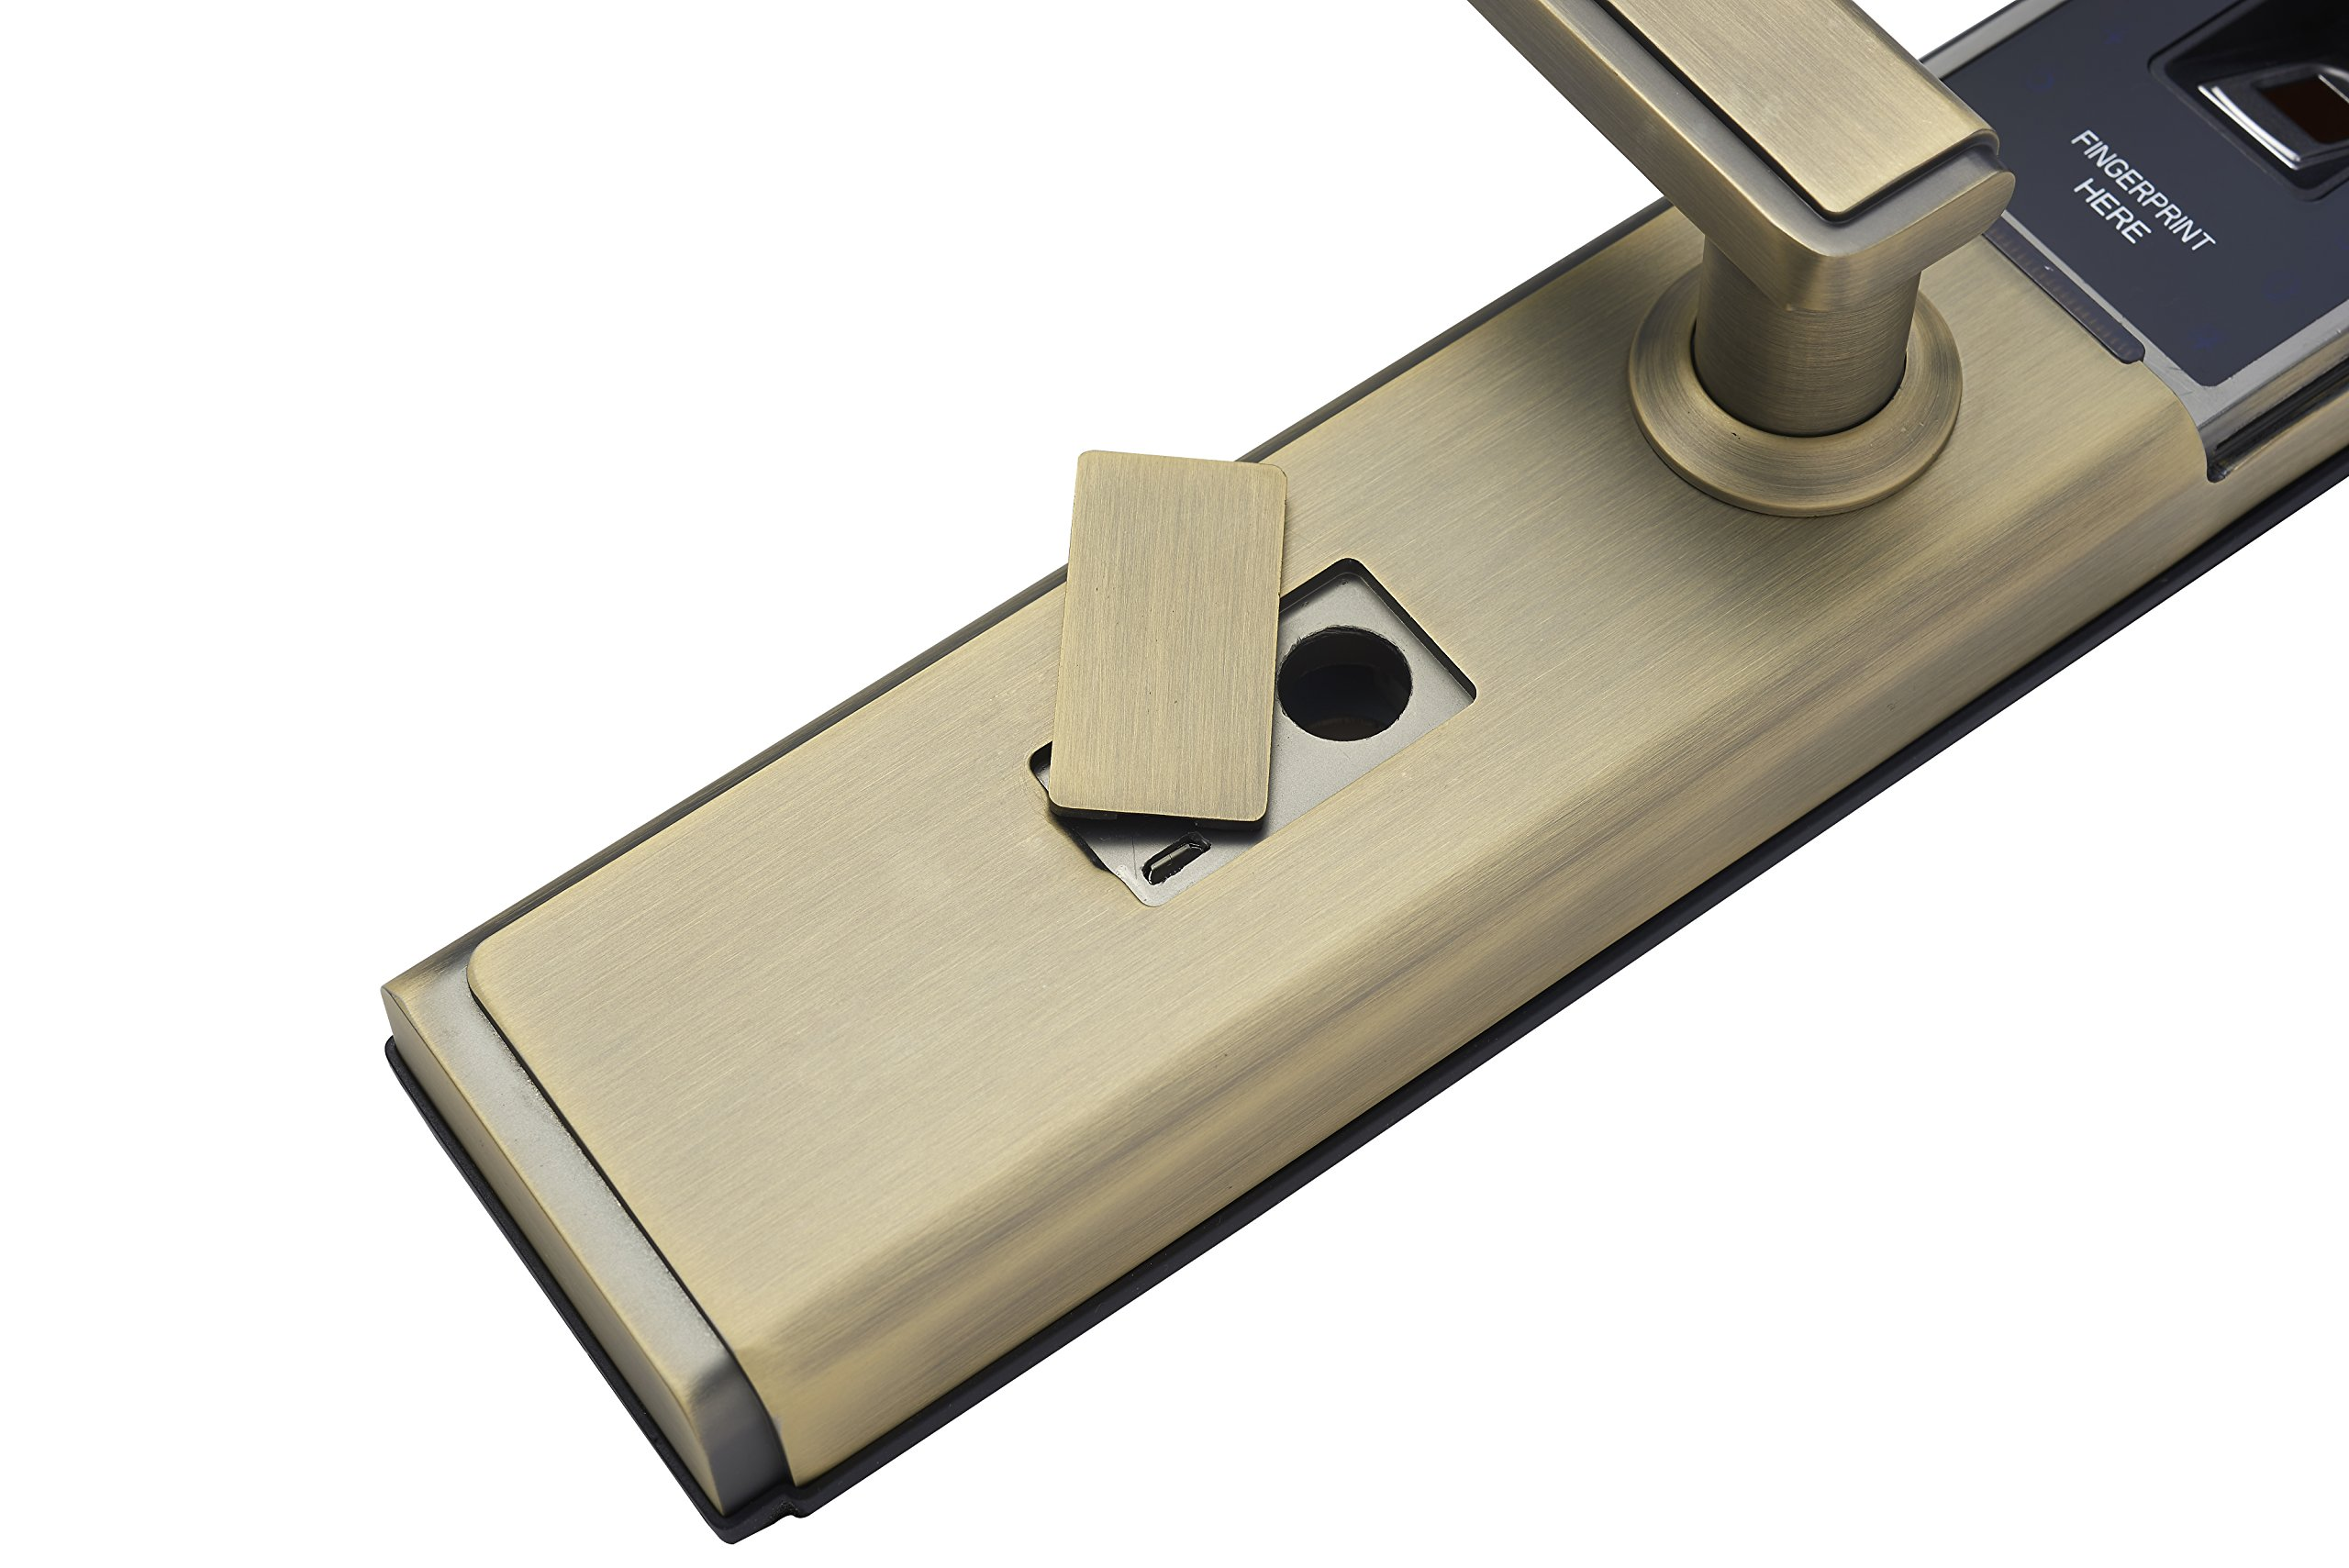 LEGU Fingerprint and Touchscreen Keyless Smart Lever Lock for Door fingerprint+password+card+key/Security intelligent anti-theft lock (Left handed) by LEGU (Image #3)